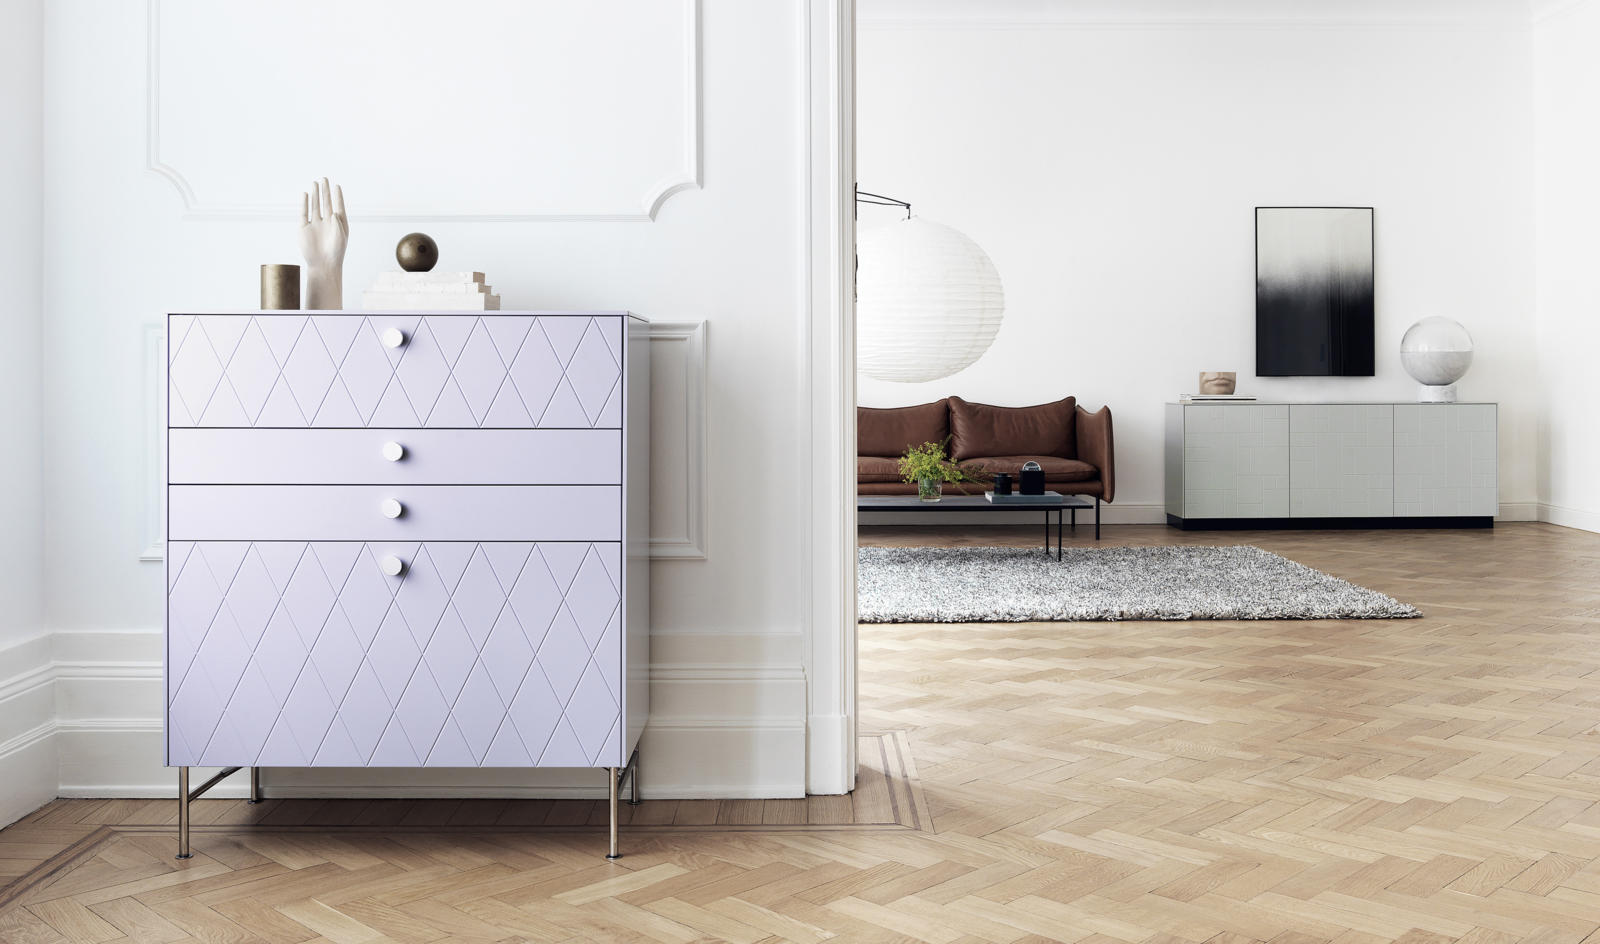 superfront-storage-drawers-on-ikea-metod-cabinet.pattern-harlequin.jpg